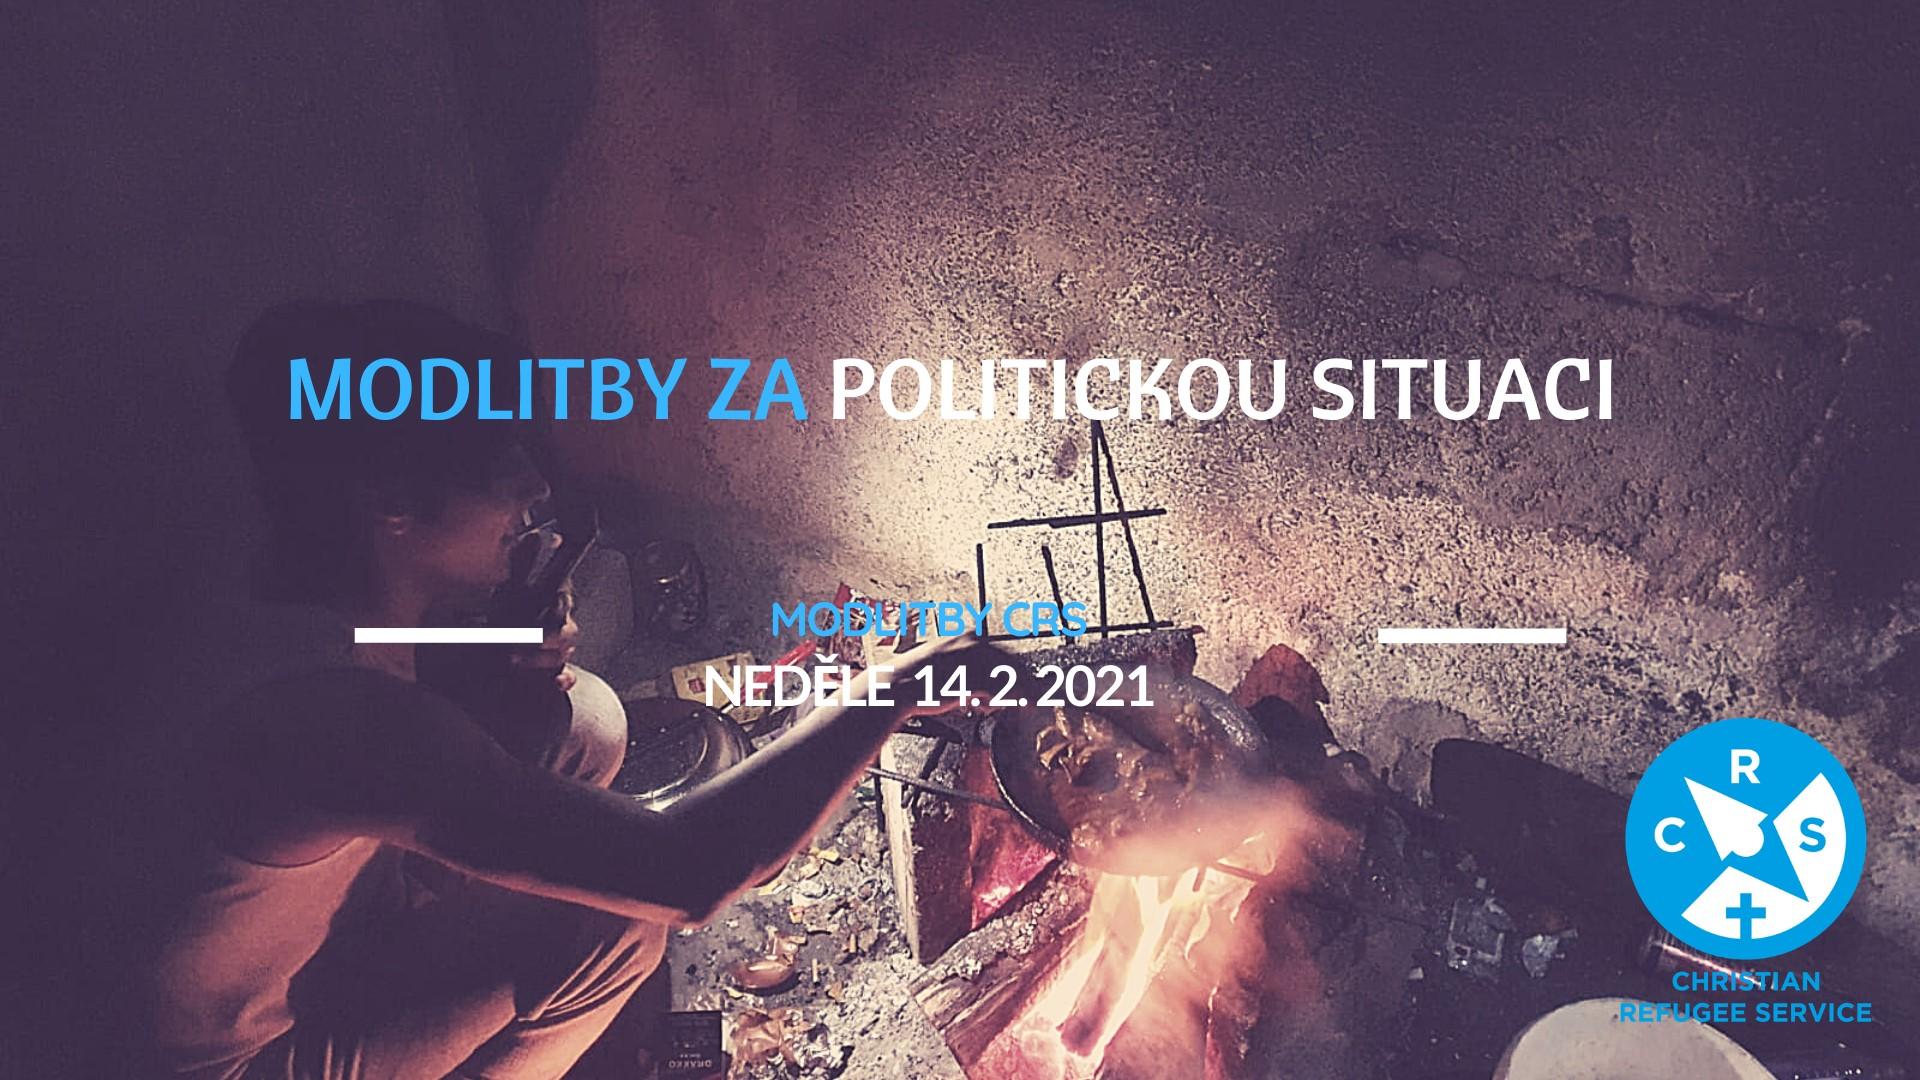 Modlitby II. – Politická situace